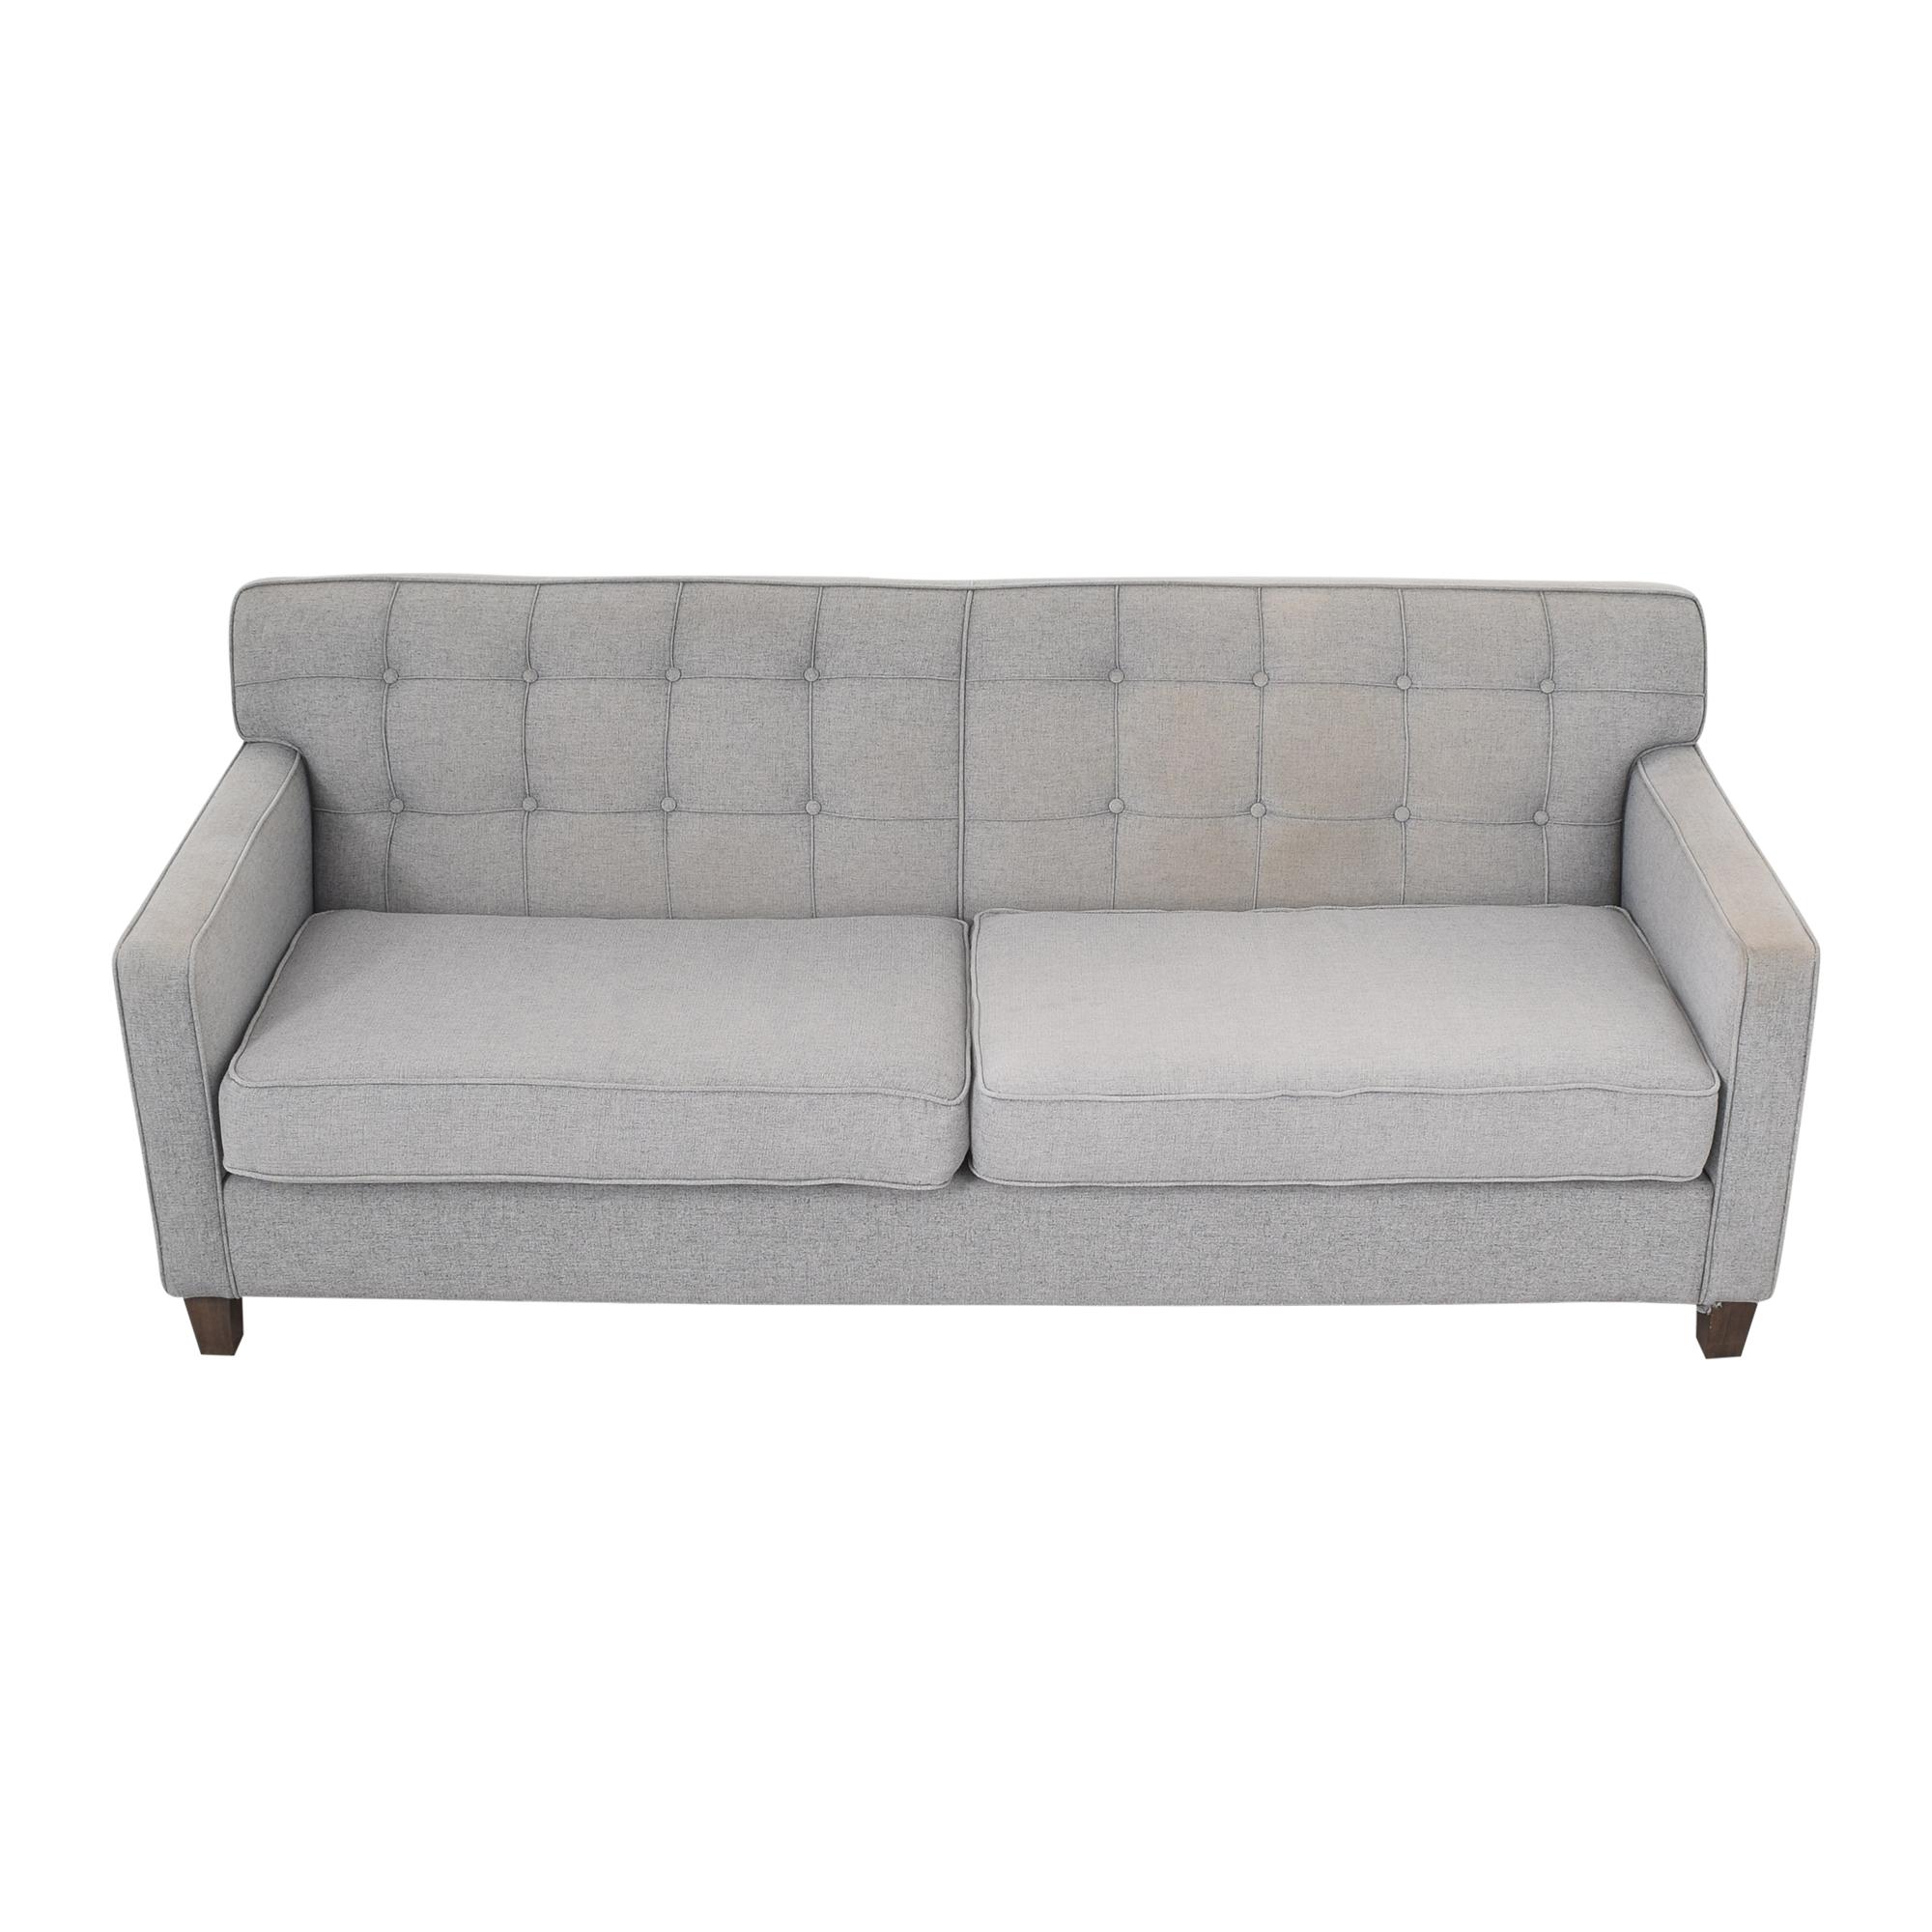 buy G. Romano Tufted Two Cushion Sofa G. Romano